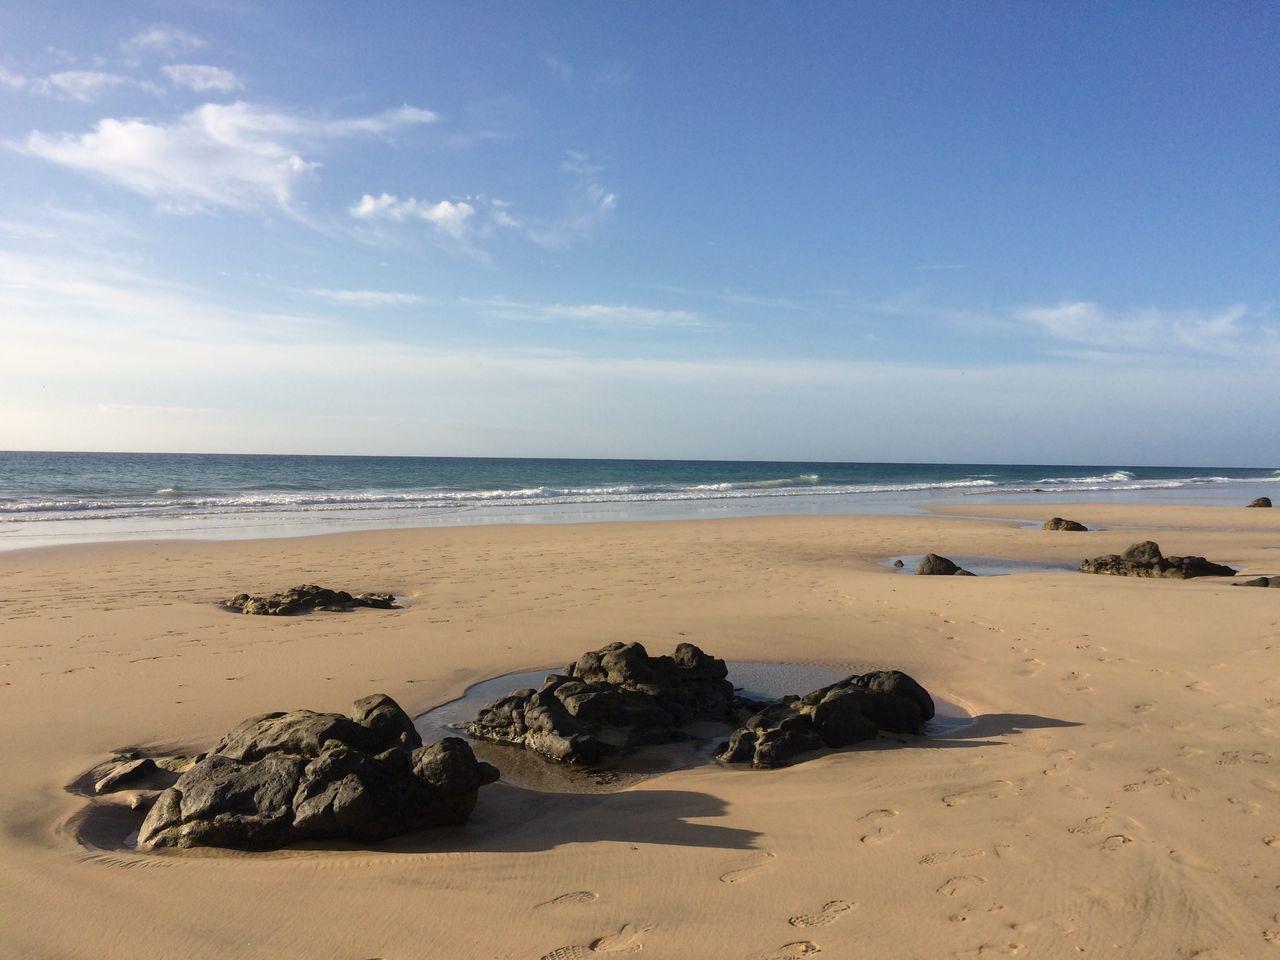 Sea Beach Horizon Over Water Outdoors Sky No People Day Fuerteventura Tui Magic Life Sand & Sea Sand Reflection First Eyeem Photo EyeEmNewHere